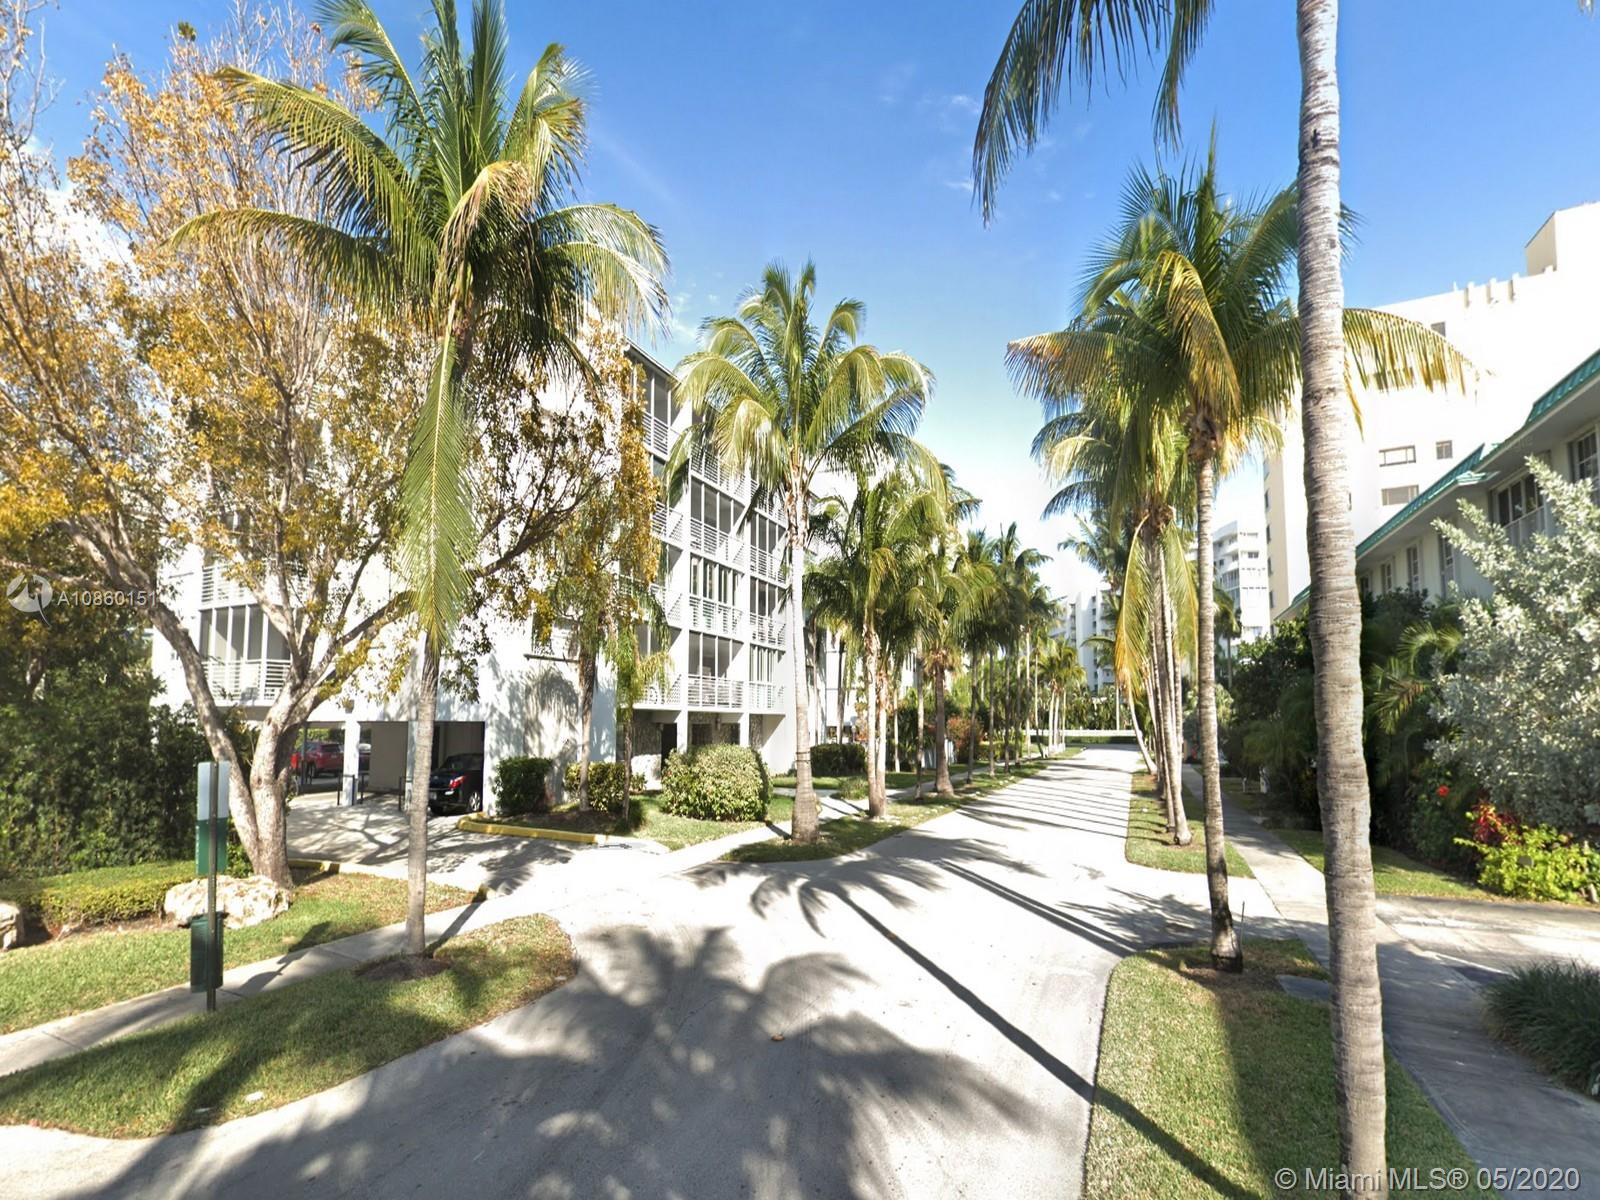 300 Sunrise Dr Unit 2 A, Key Biscayne, Florida 33149